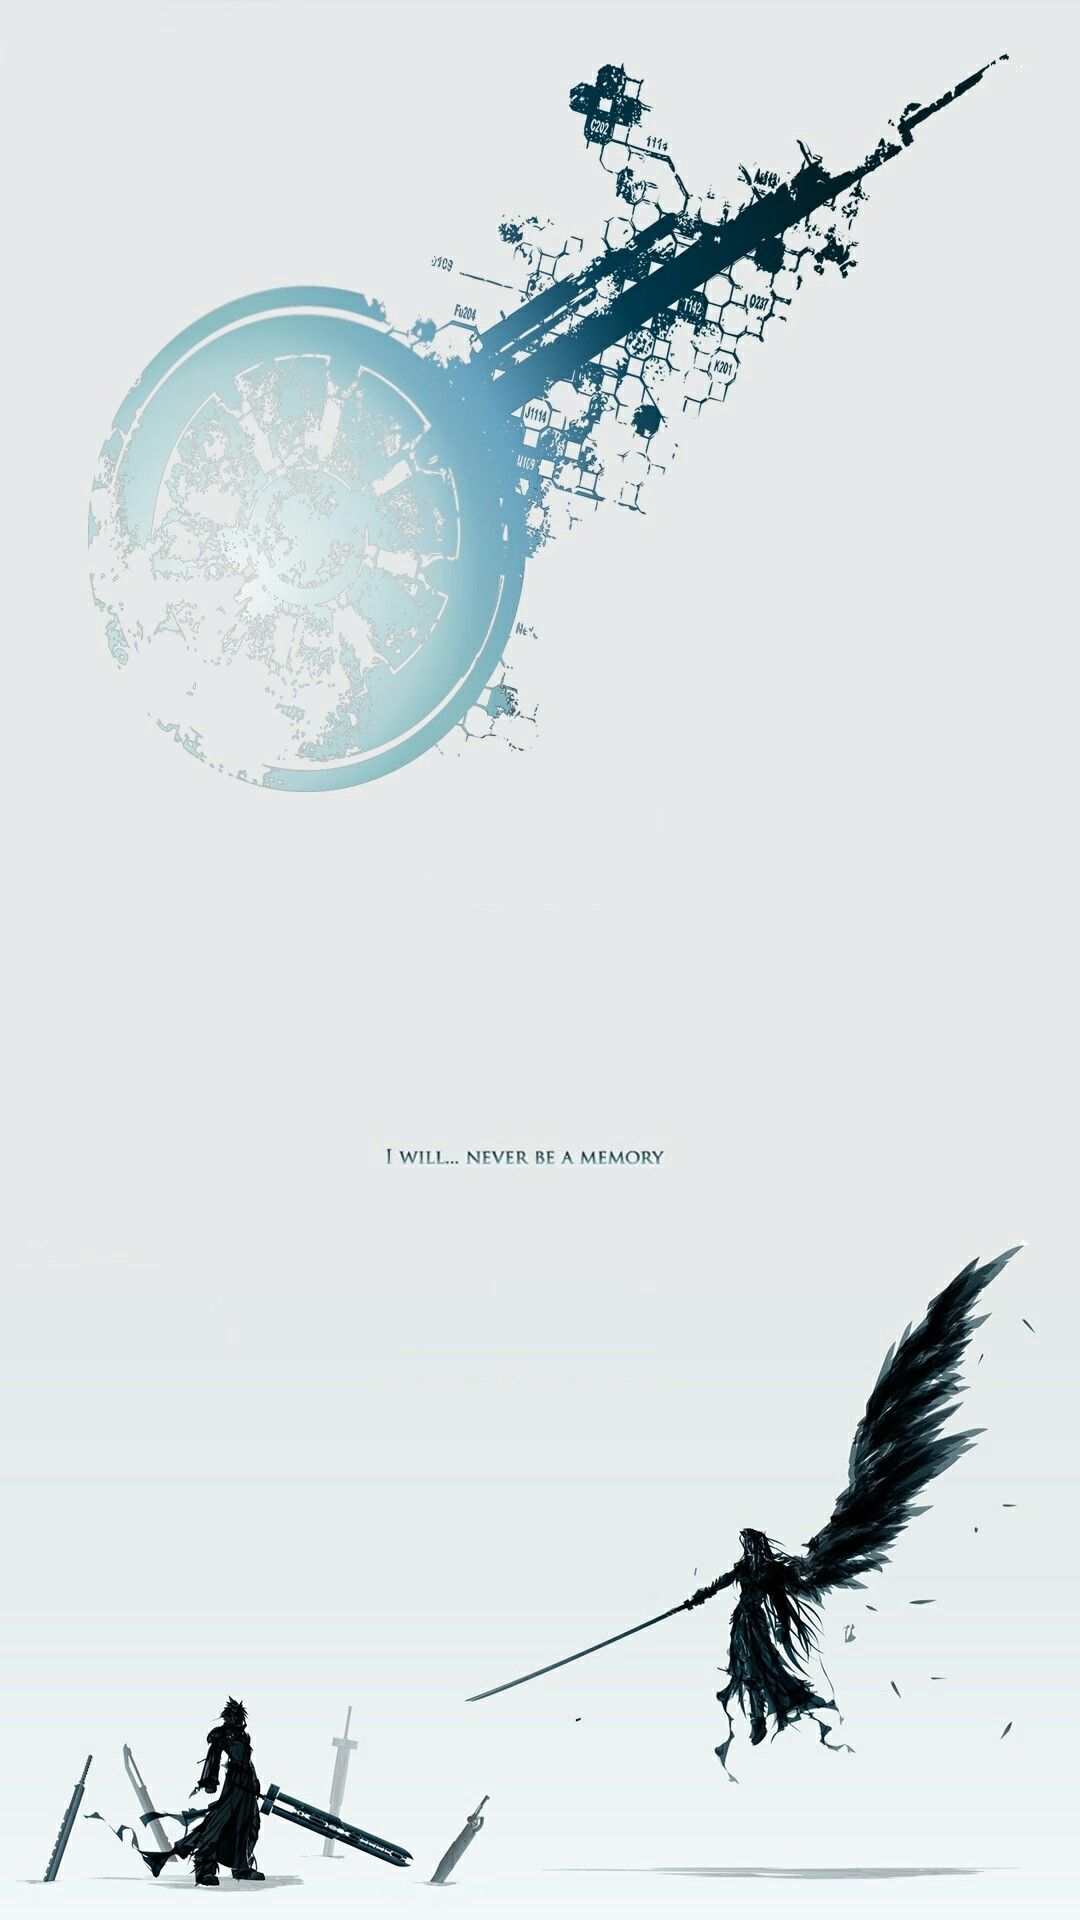 Final Fantasy Vii Lockscreen Wallpaper Final Fantasy Logo Final Fantasy Wallpaper Hd Final Fantasy Artwork